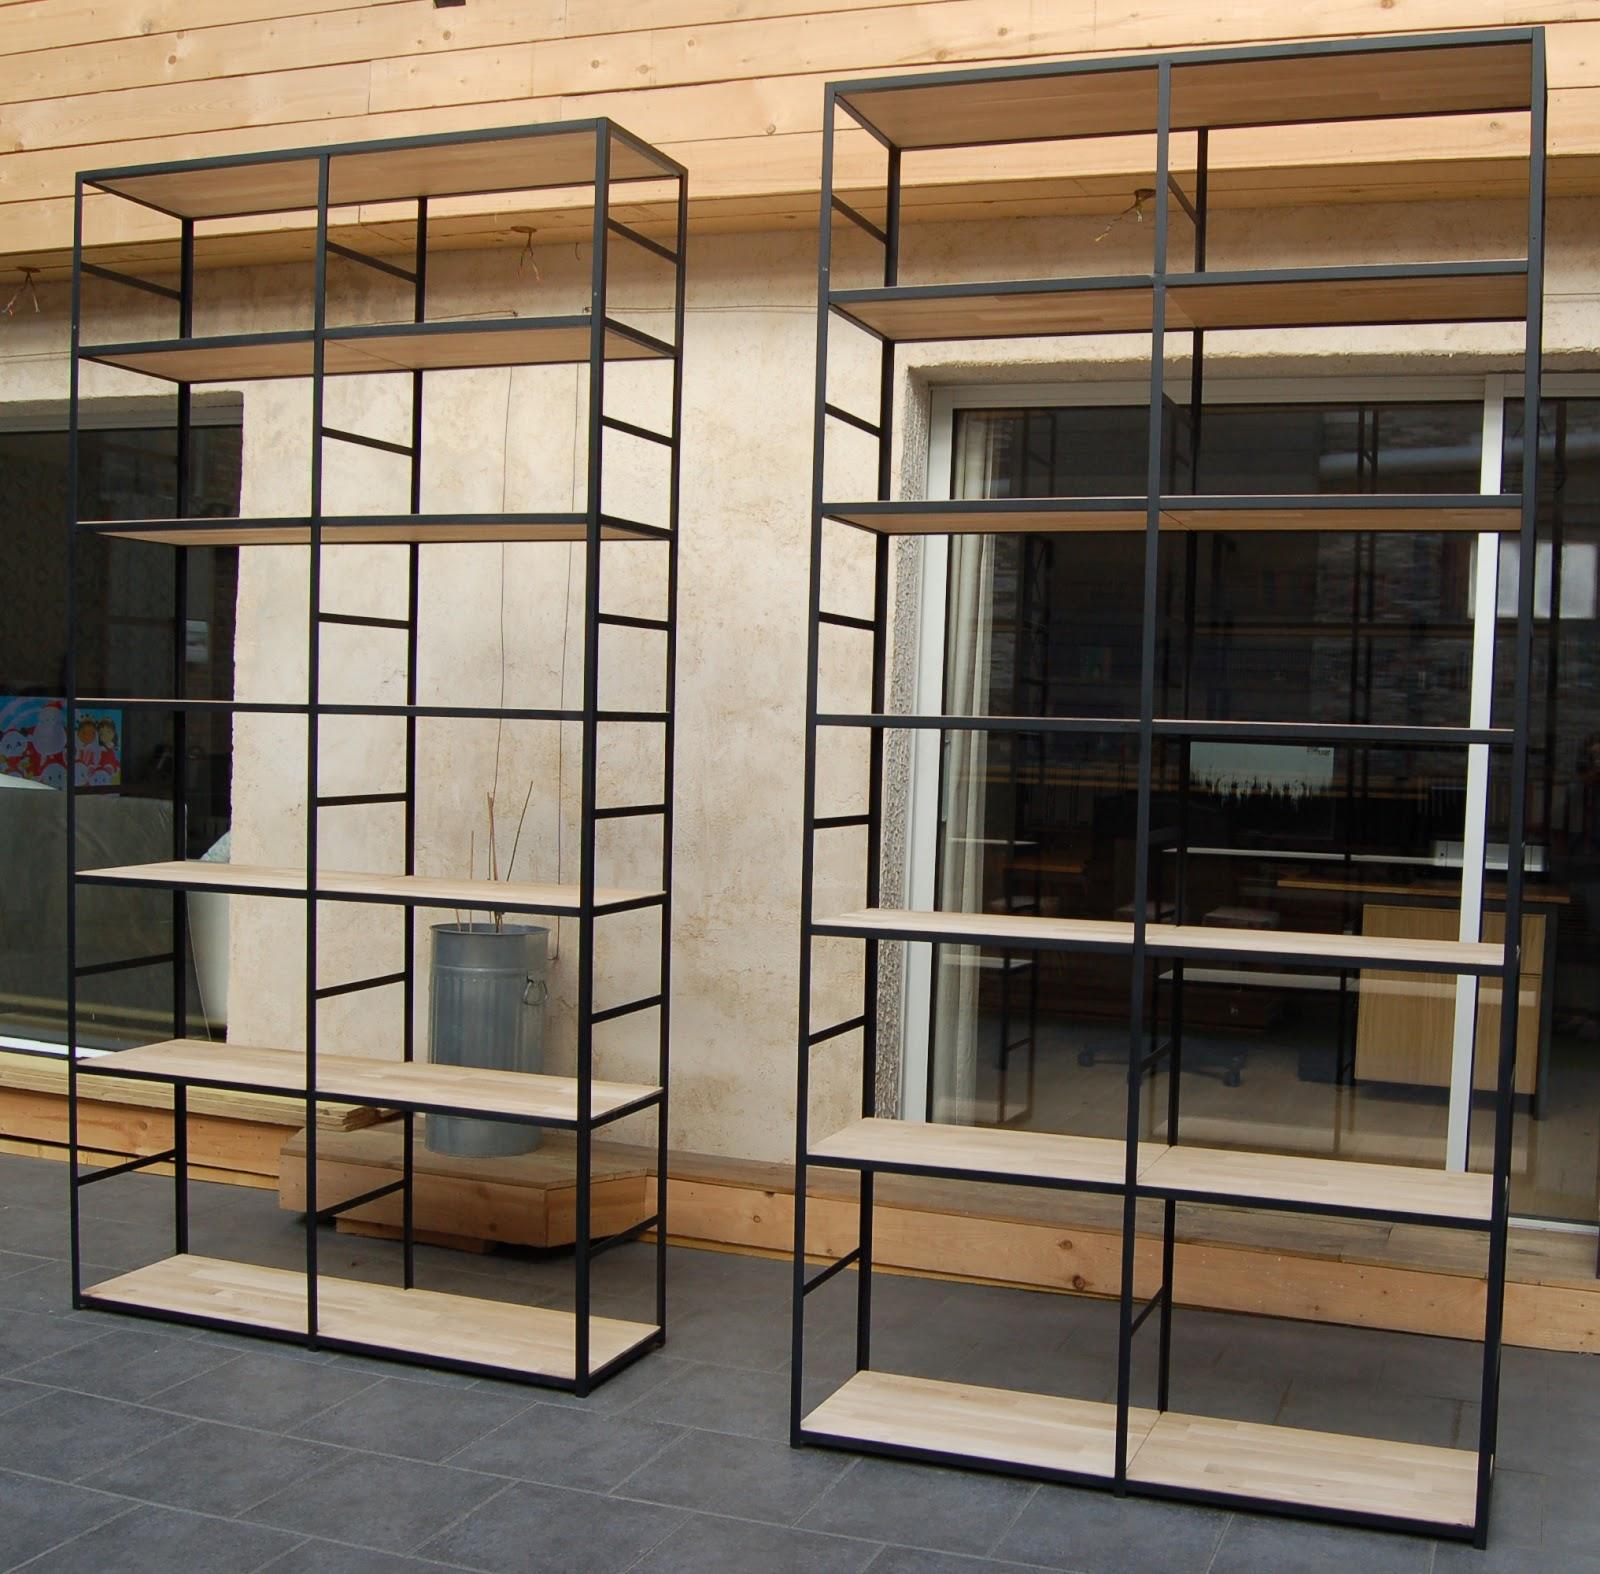 blog de la maison de l 39 imaginarium l 39 ambiance factory 100 sur mesure lot de 2 biblioth ques. Black Bedroom Furniture Sets. Home Design Ideas